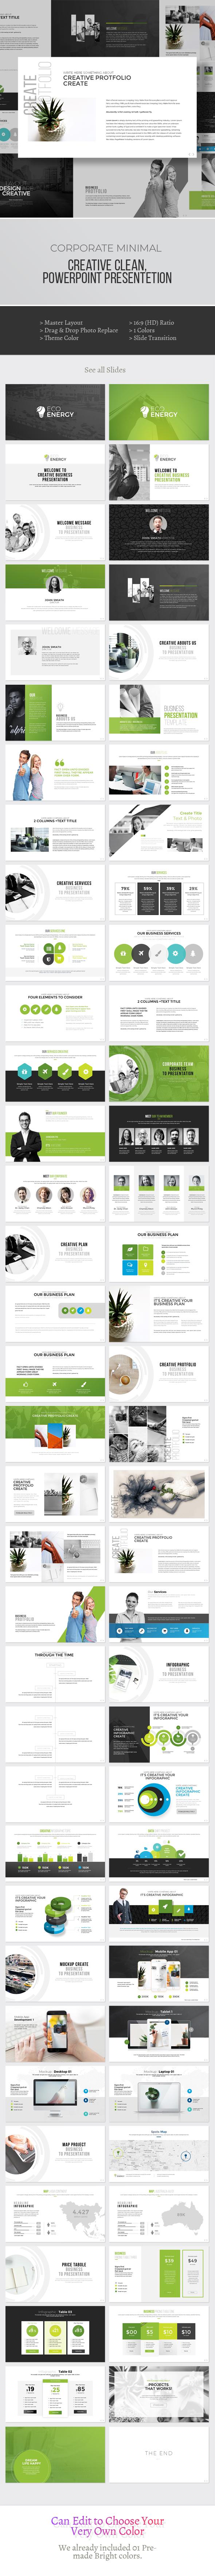 Green Energy - PowerPoint Template - PowerPoint Templates Presentation Templates